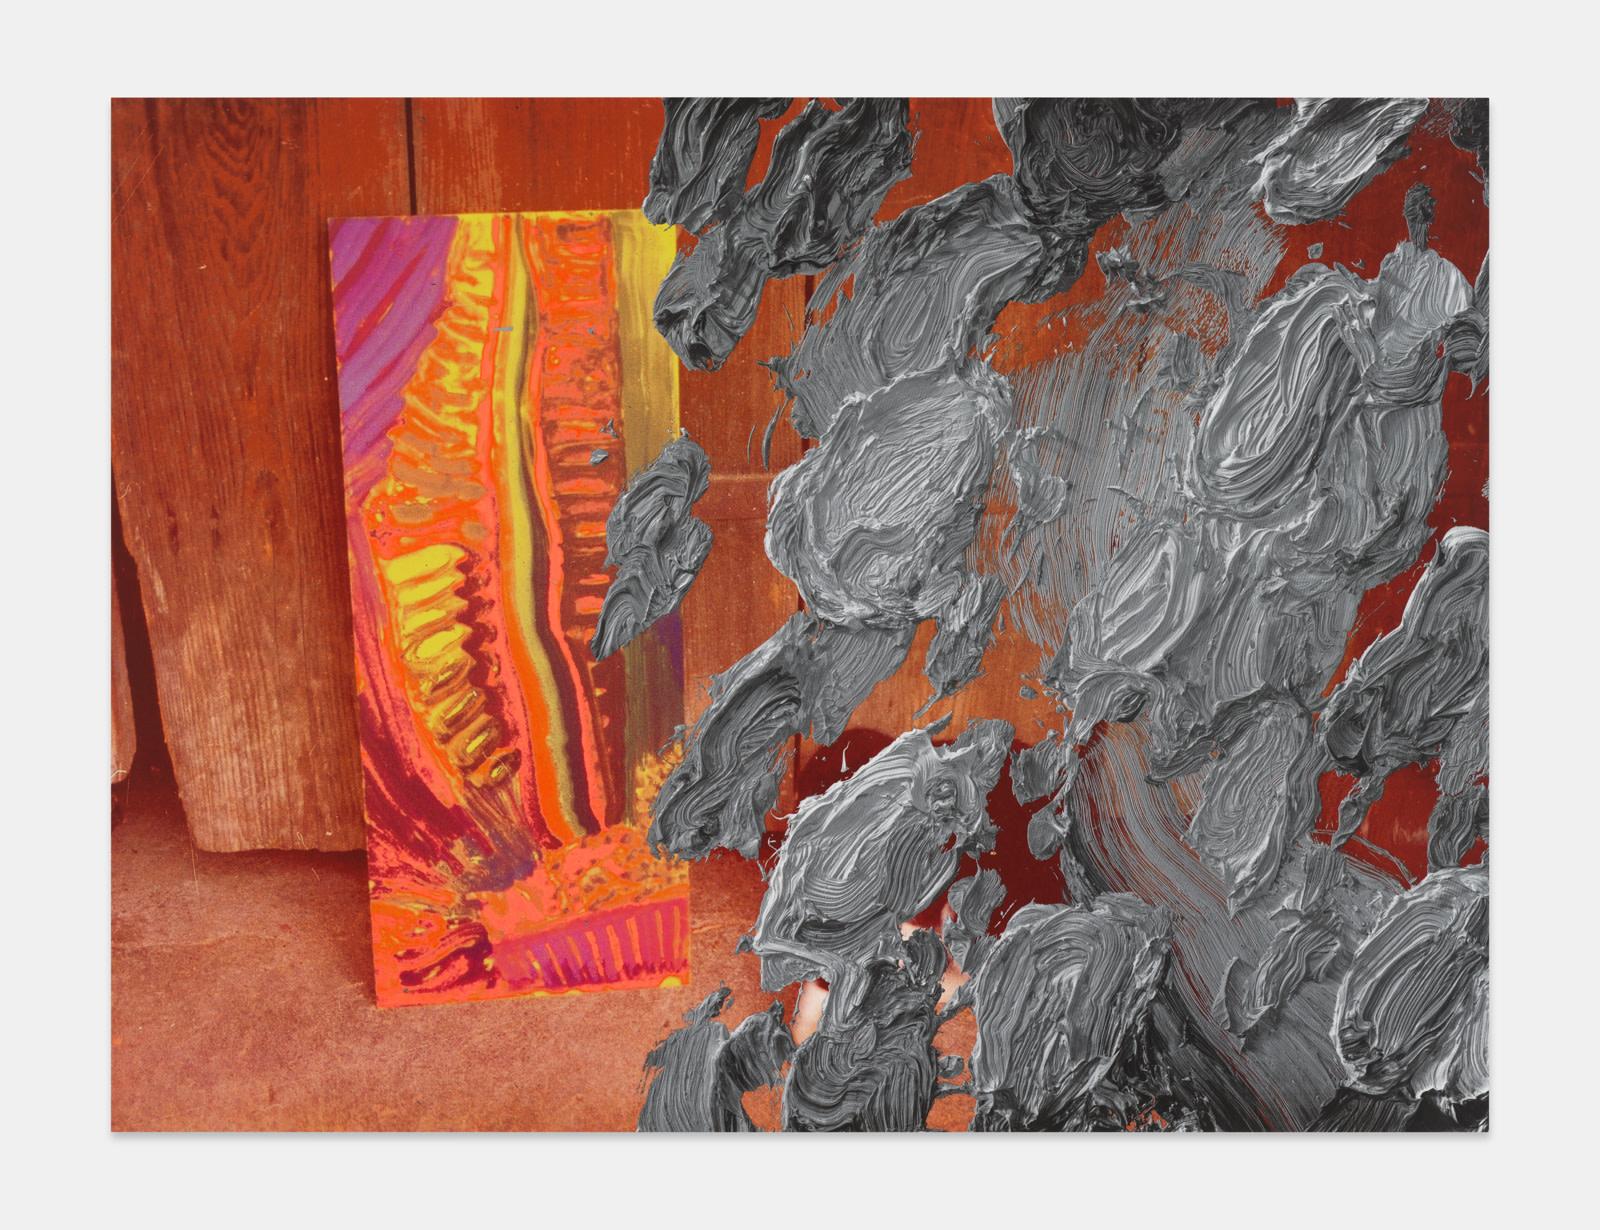 "<div class=""artwork_caption""><div class=""title""><em>James</em>, 2021</div><div class=""medium"">aluminium composite panel, aluminium honeycomb, polyurethane adhesive, epoxy primer, gesso, solvent-based screen printing paint, water-based screen printing paint</div><div class=""dimensions"">site size: 152.4 x 203.2 x 2.2 cm / 60 x 80 x ⅞ in<br />frame size: 156.2 x 207 x 5.1 cm / 61 ½ x 81 ½ x 2 in</div></div><div class=""link""><span class=""website_contact_form"" data-contact-form-details=""James, 2021  aluminium composite panel, aluminium honeycomb, polyurethane adhesive, epoxy primer, gesso, solvent-based screen printing paint, water-based screen printing paint  site size: 152.4 x 203.2 x 2.2 cm / 60 x 80 x ⅞ in frame size: 156.2 x 207 x 5.1 cm / 61 ½ x 81 ½ x 2 in"" data-contact-form-image=""https://artlogic-res.cloudinary.com/w_200,h_200,c_fill,f_auto,fl_lossy/ws-sadiecoles/usr/exhibitions/images/exhibitions/859/uf21024_james_b_rt-flat_canonical.jpeg"">Enquire</span></div>"